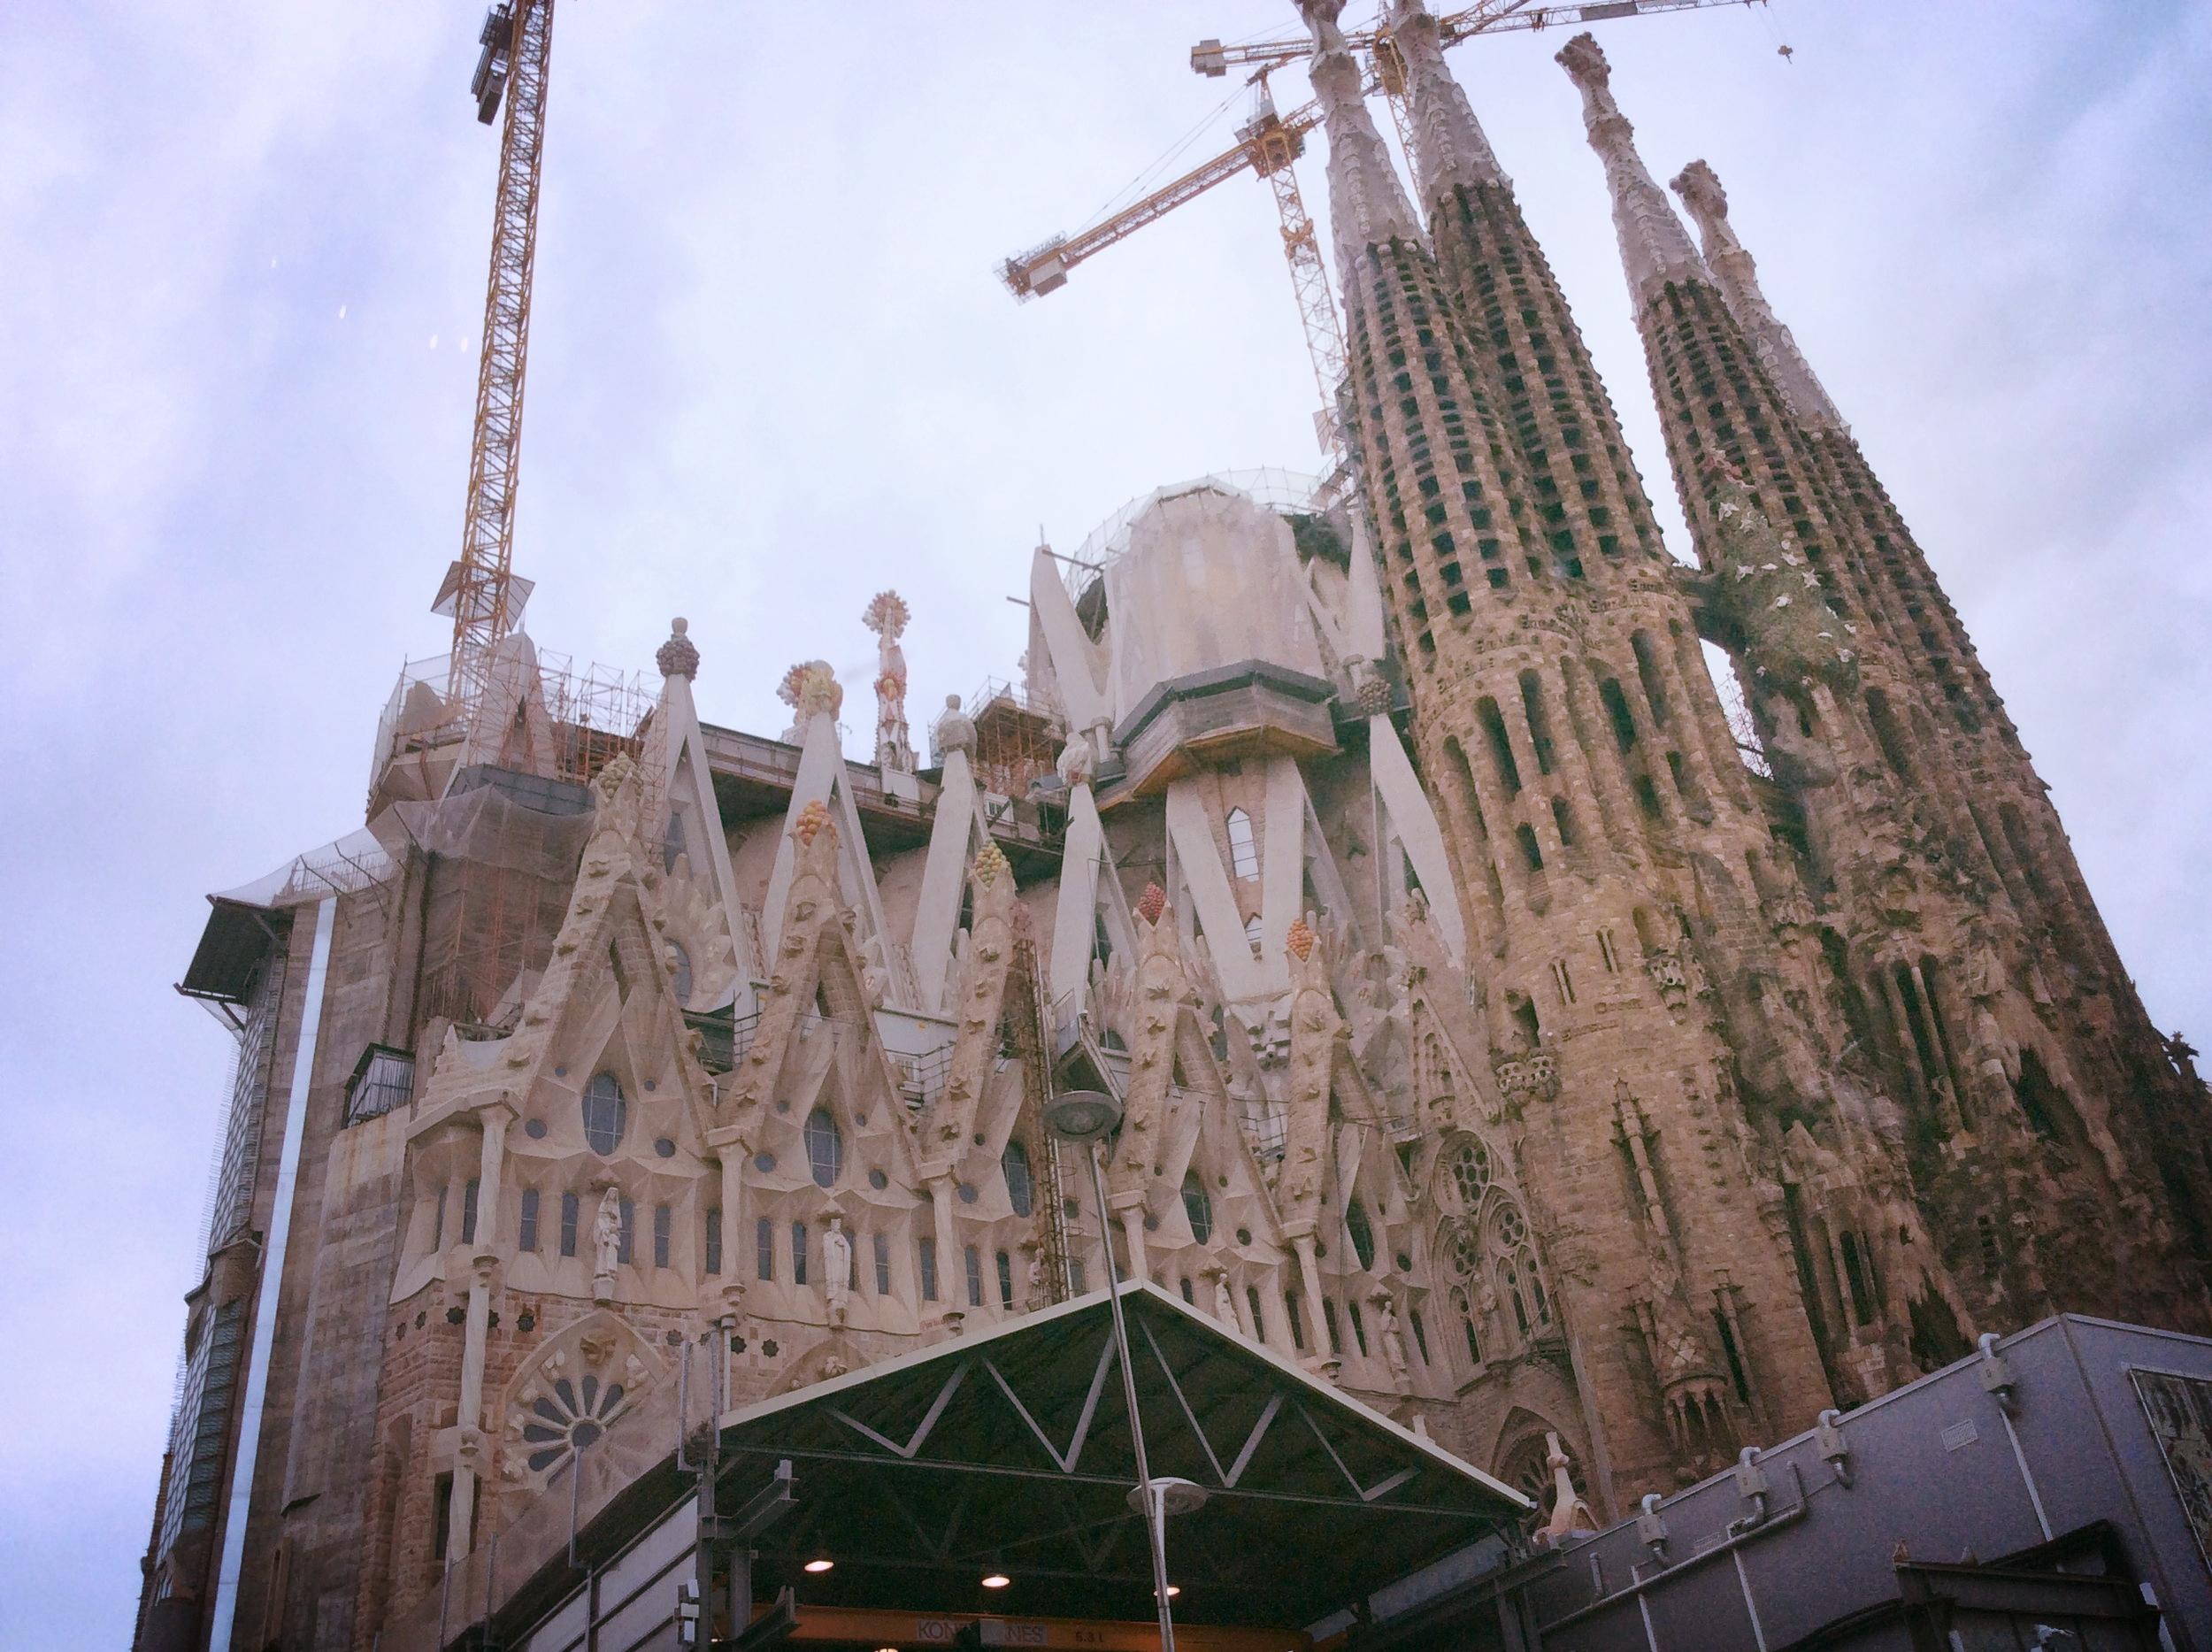 20161021_Barcelona_Sagrada_Familia_iPhone_IMG_4275.JPG